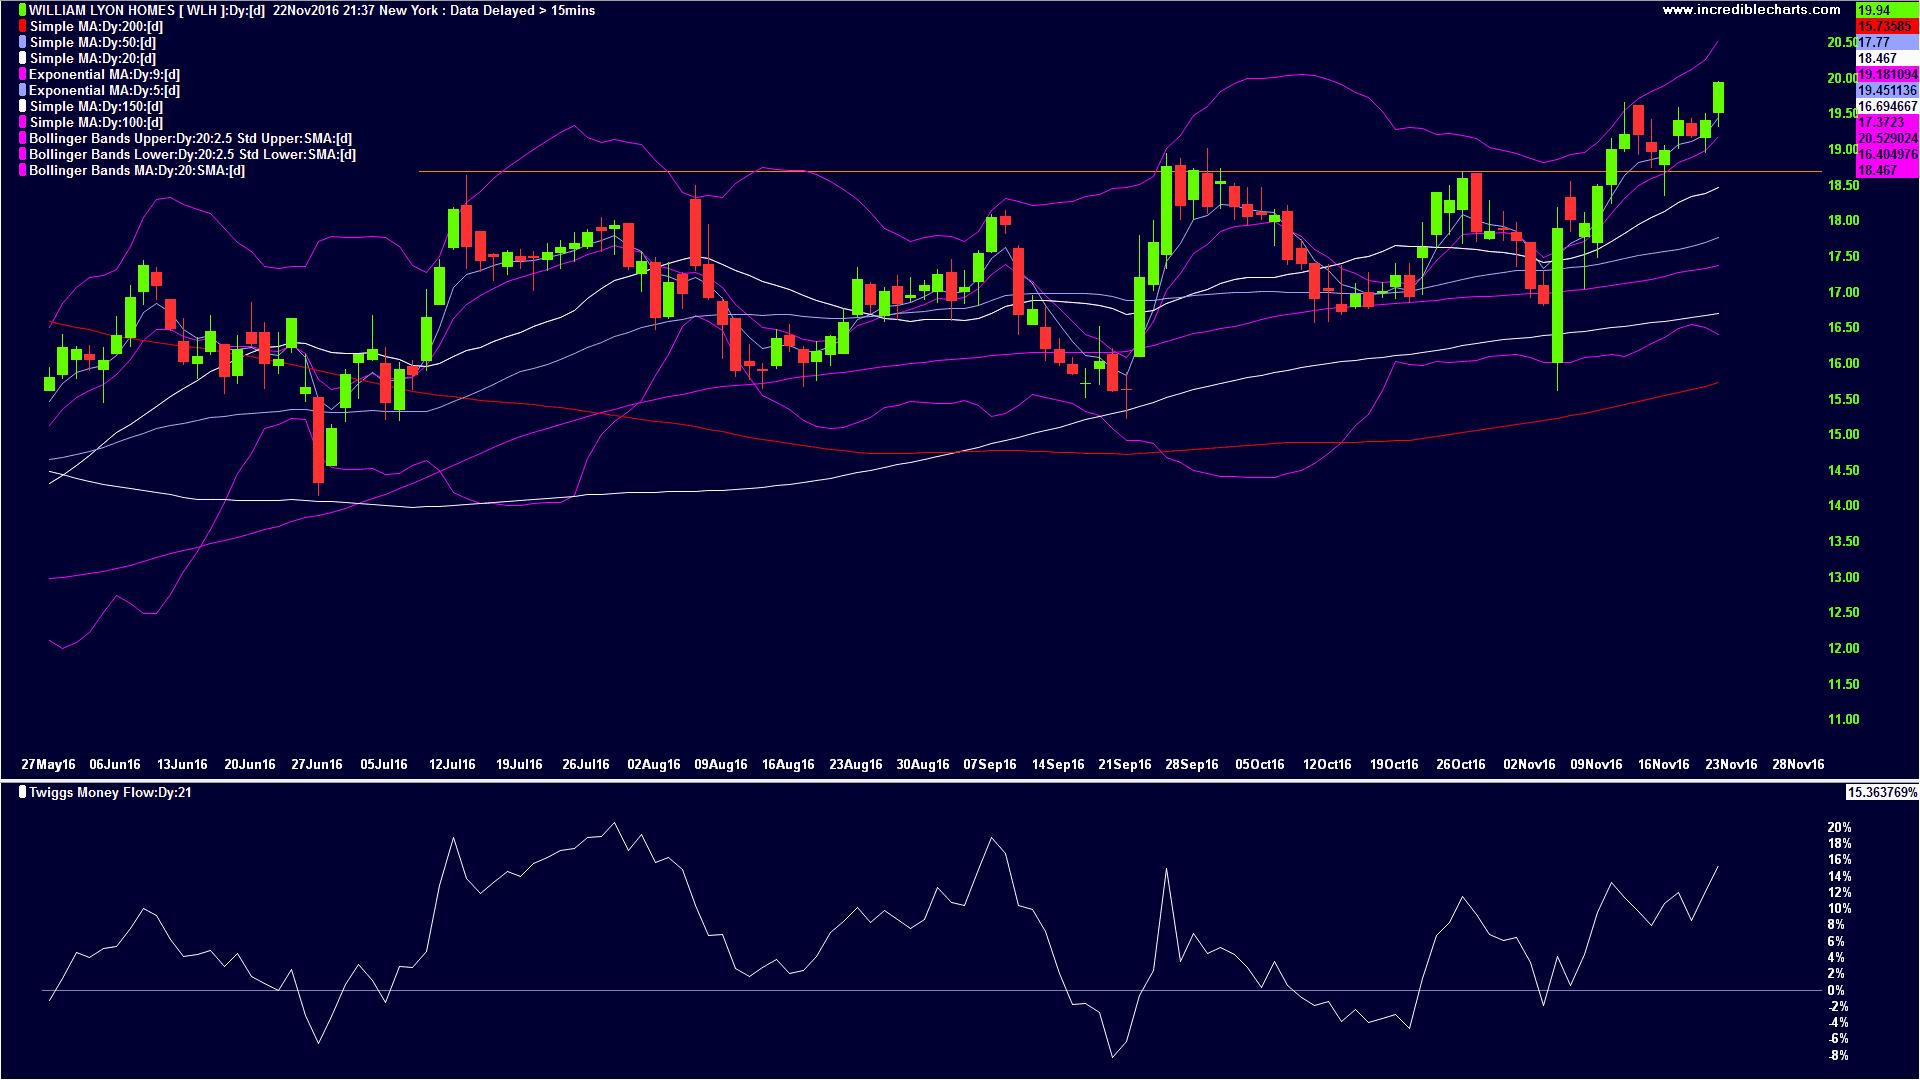 Stocks With Bullish Money Flow 11-22-16